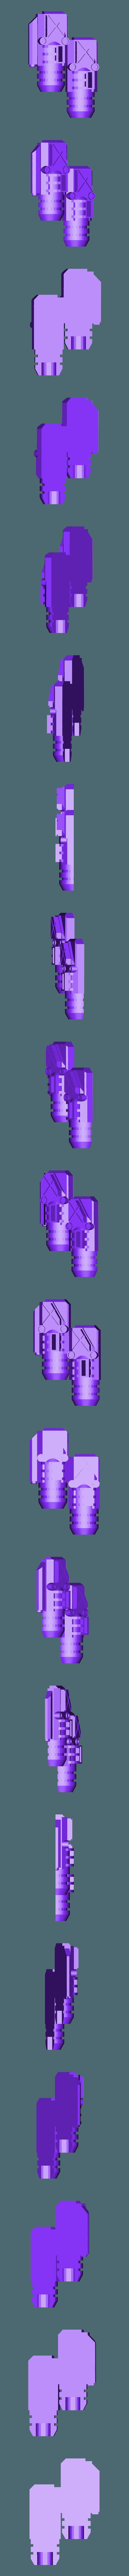 Gun_Right_Top.stl Download free STL file Interstellar Army - Quad Mortar and Quad Cannon • 3D printing model, Cikkirock